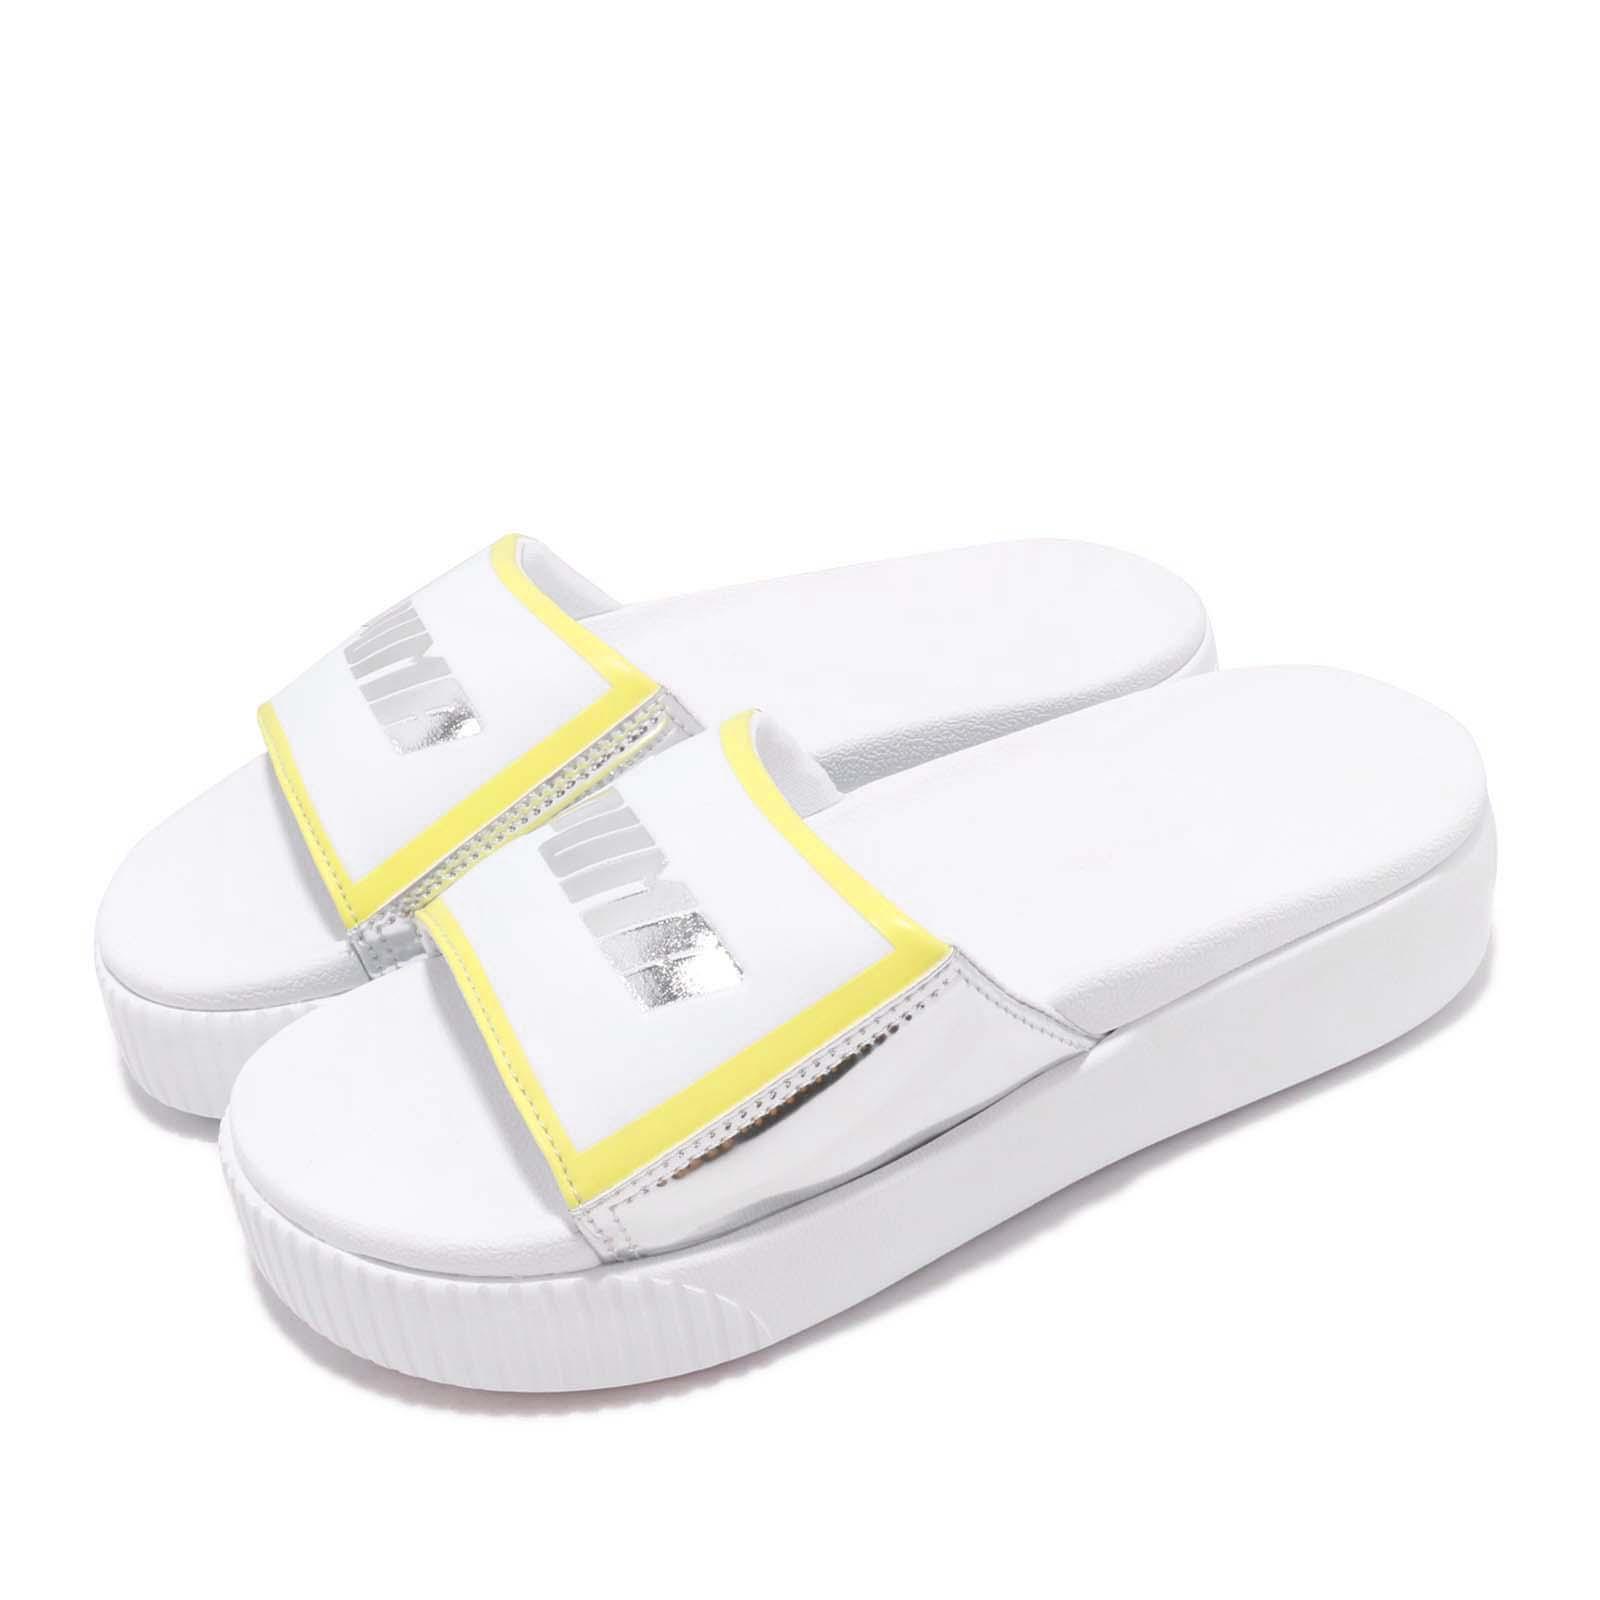 Puma 涼拖鞋 Platform Slide 穿搭 女鞋 36942101